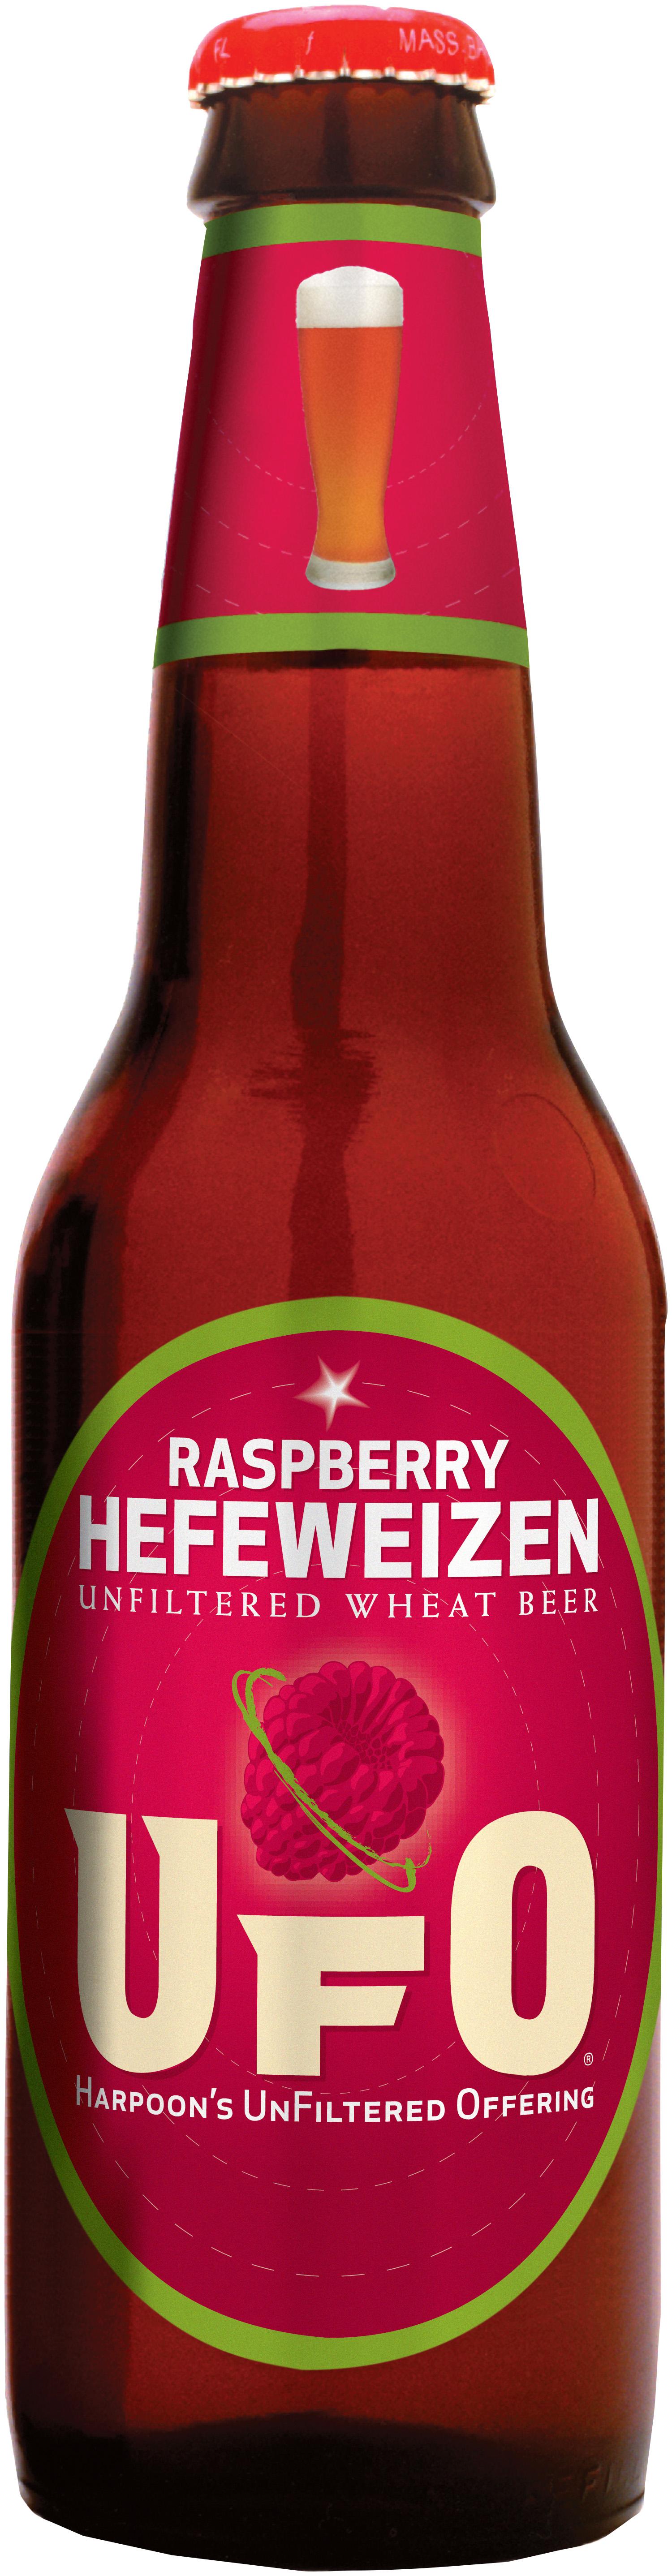 RaspberryUFO_bottle.jpg